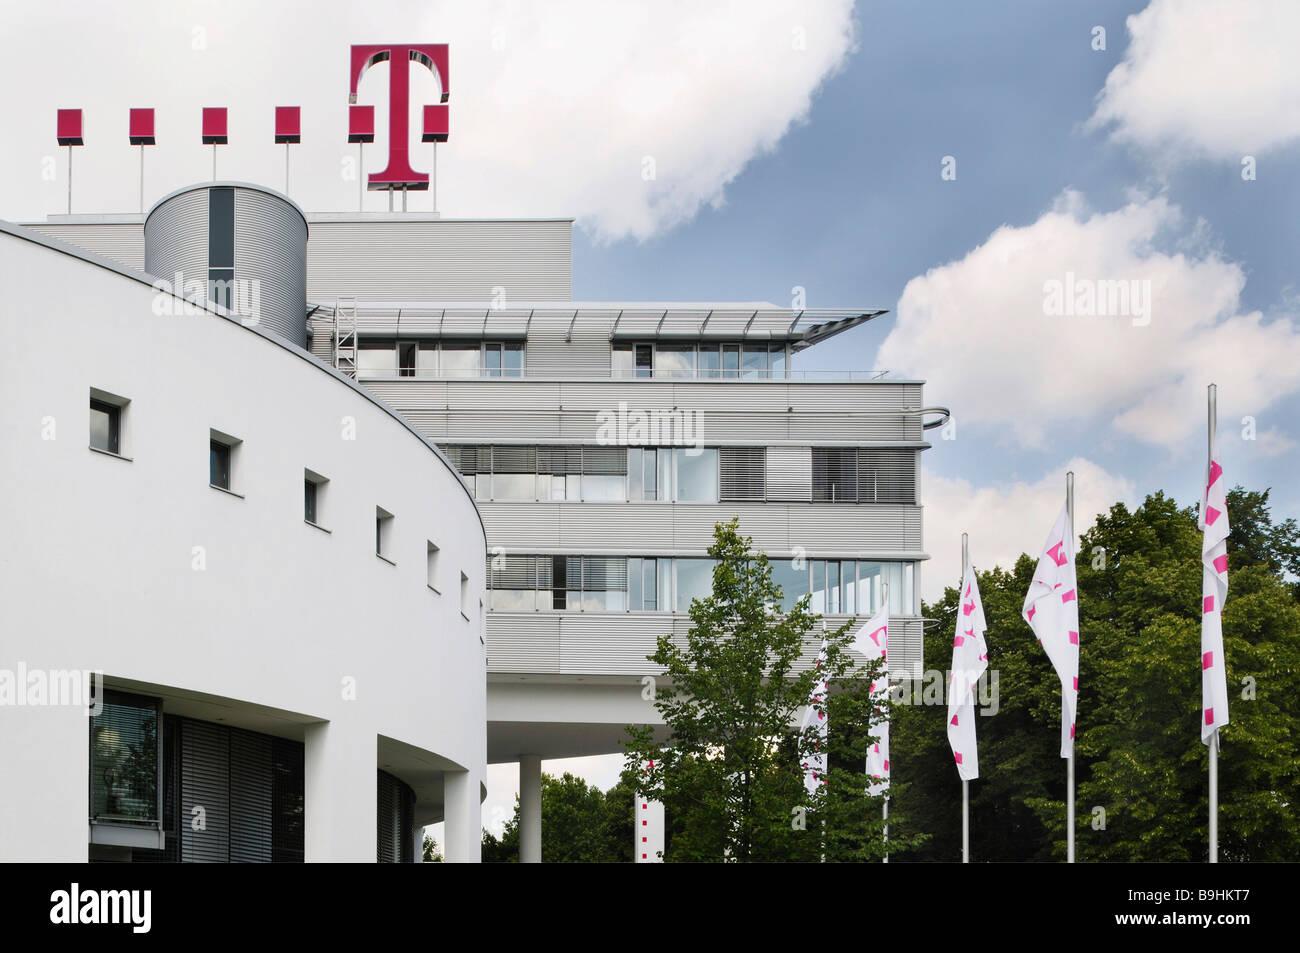 Deutsche Telekom Headquarters, Bonn, North Rhine-Westphalia, Germany, Europe - Stock Image